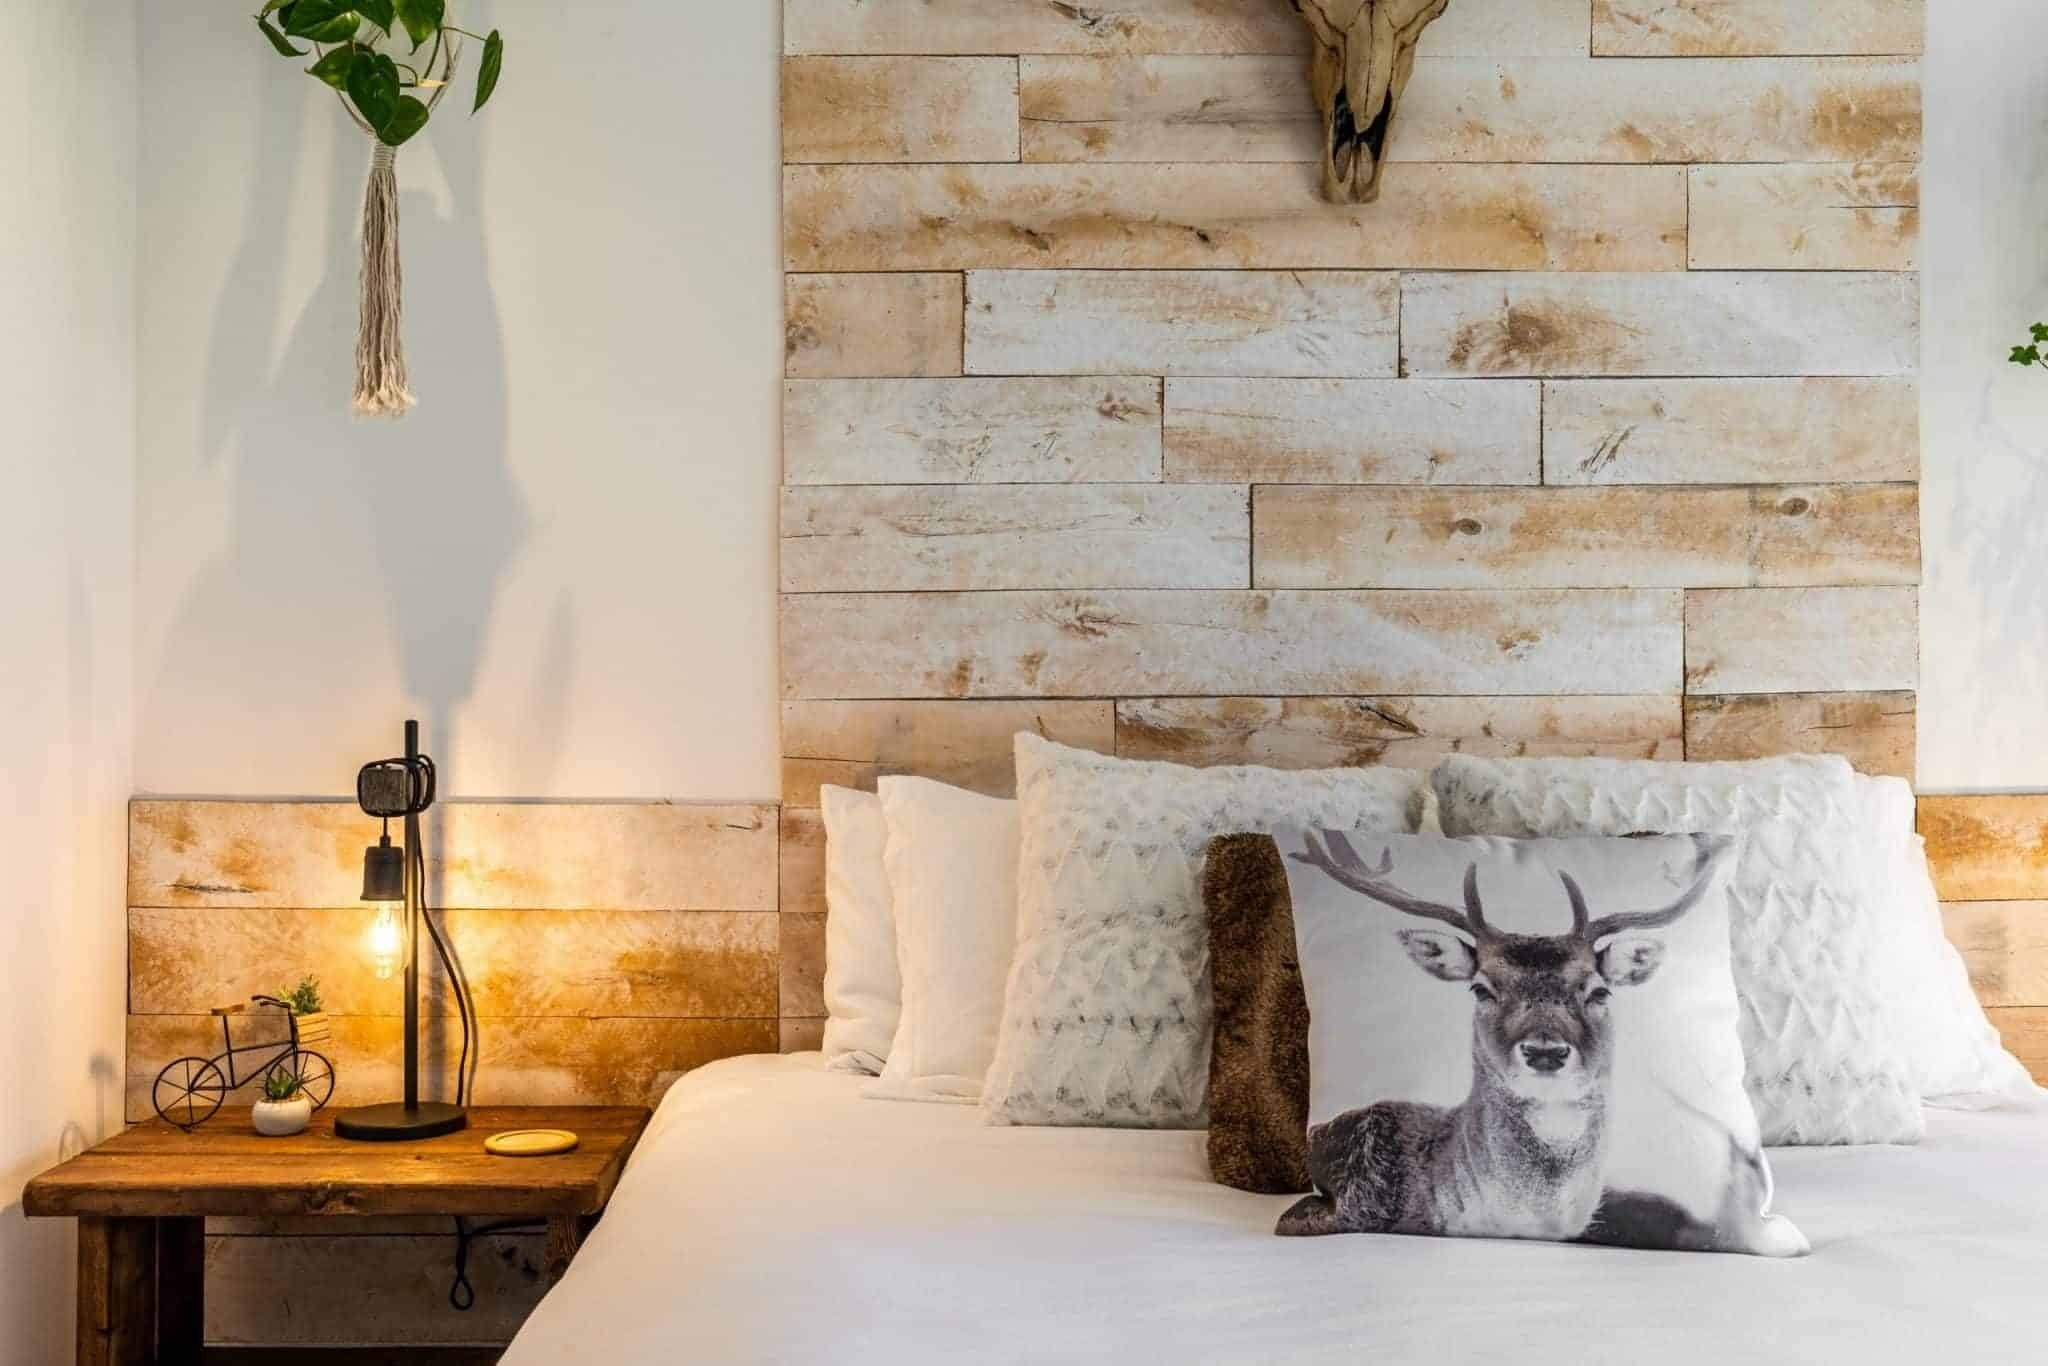 Luxueuse suite à louer au M Resort & Spa, bed & breakfast